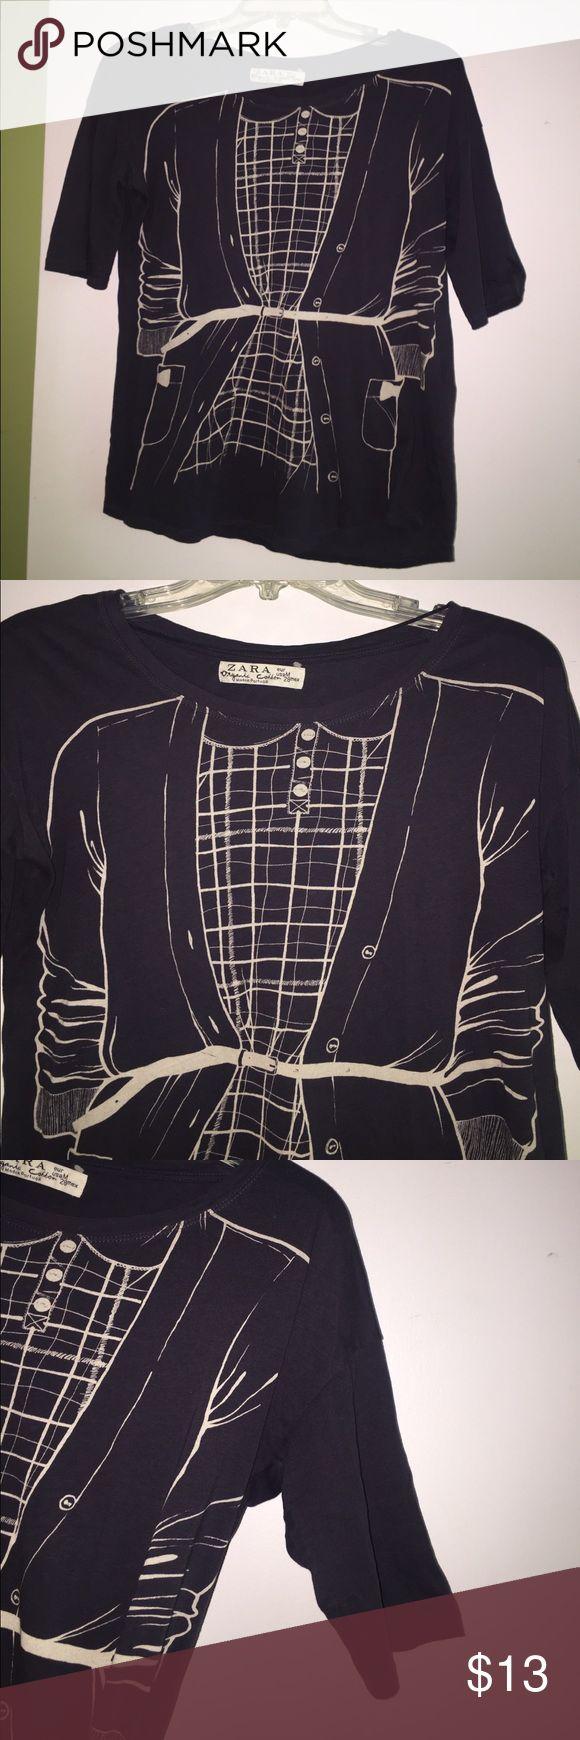 Zara tshirt Cute Zara tshirt. Short sleeves and fun design on the front! Extremely comfortable 100% cotton Zara Tops Tees - Short Sleeve